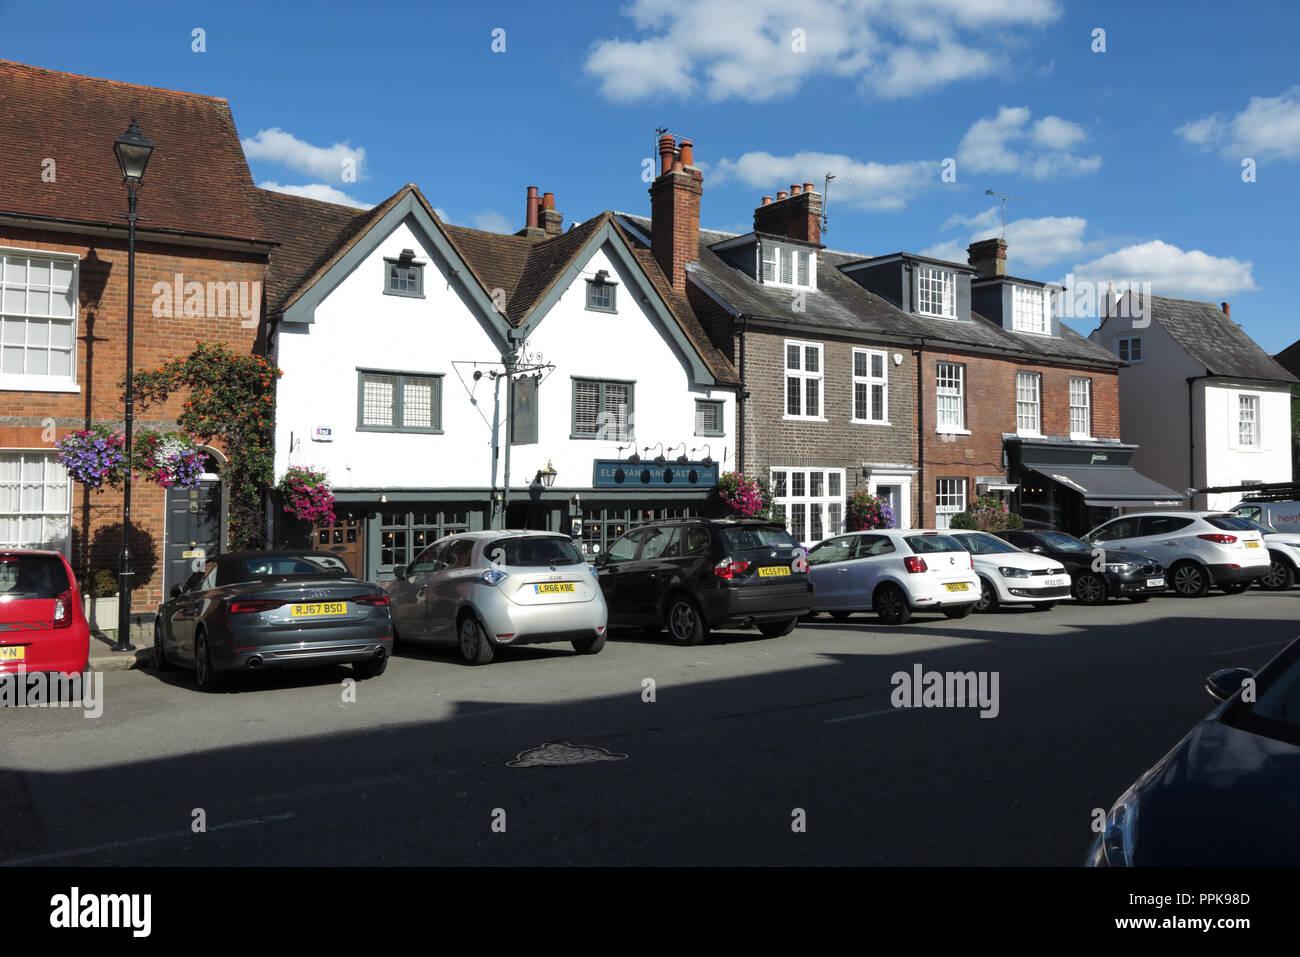 High Street, Amersham, Buckinghamshire Stock Photo